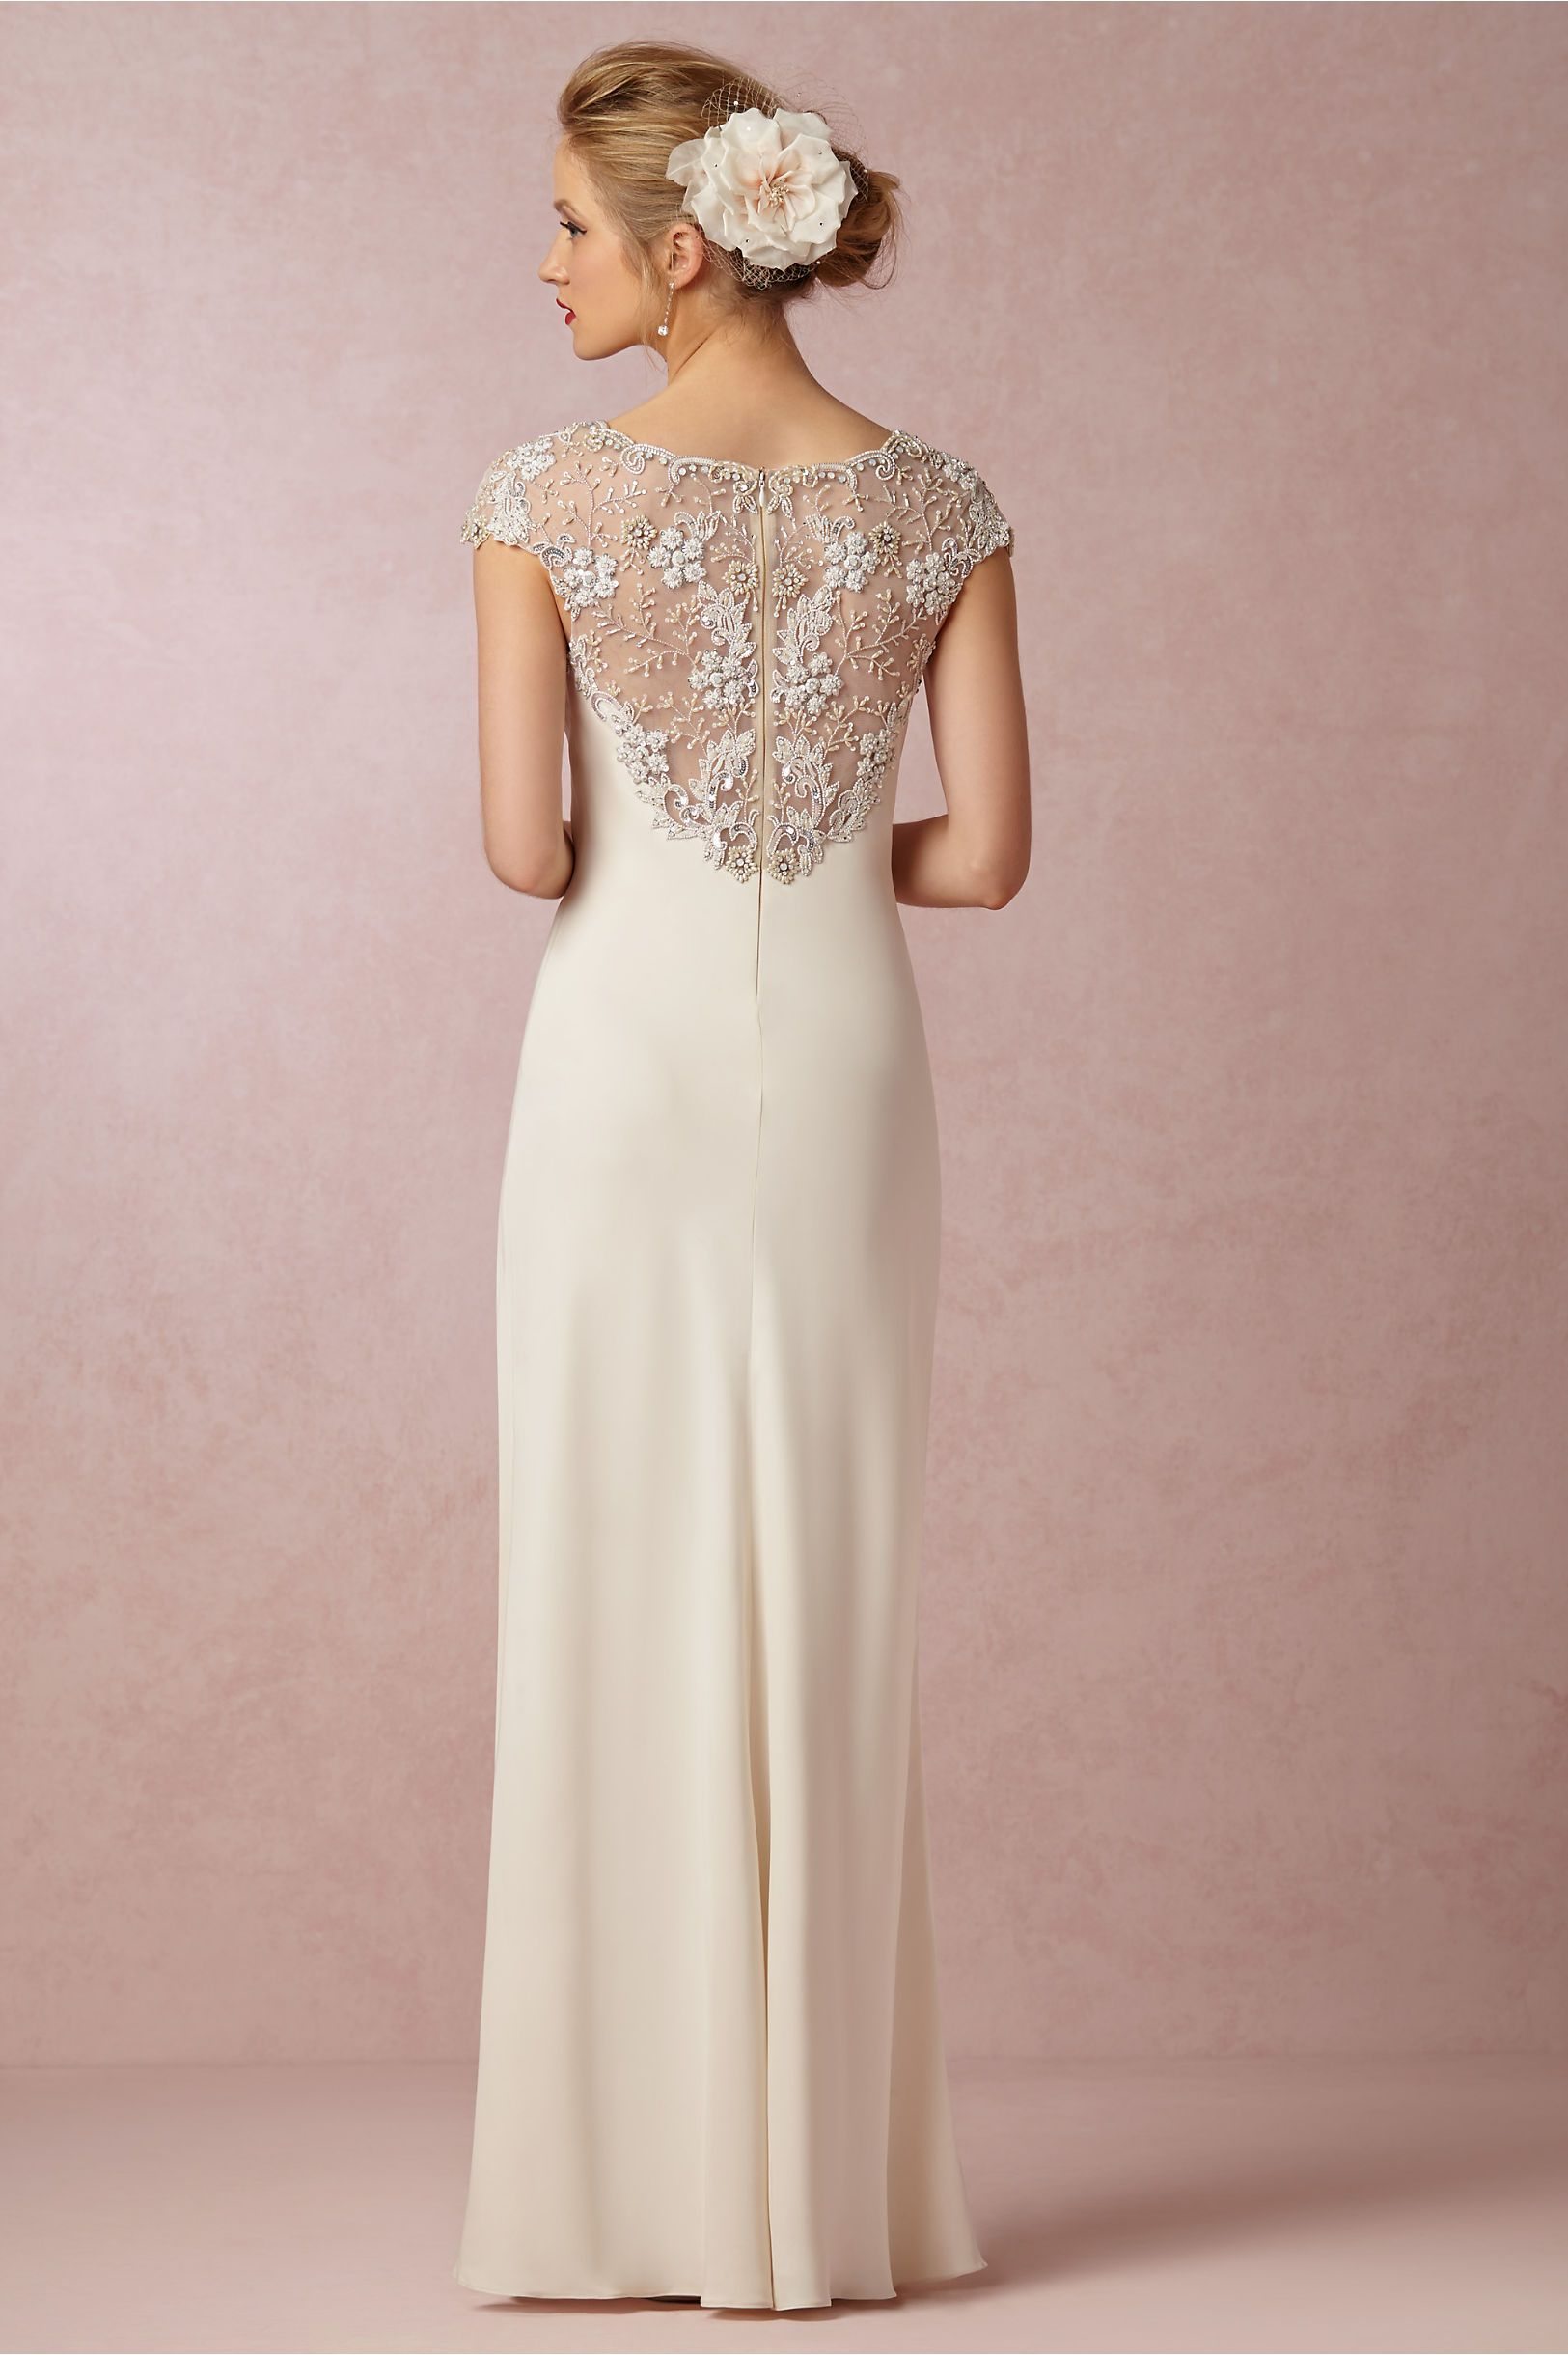 33060351_011_b (1625×2440) | beading | Pinterest | Vestidos de novia ...